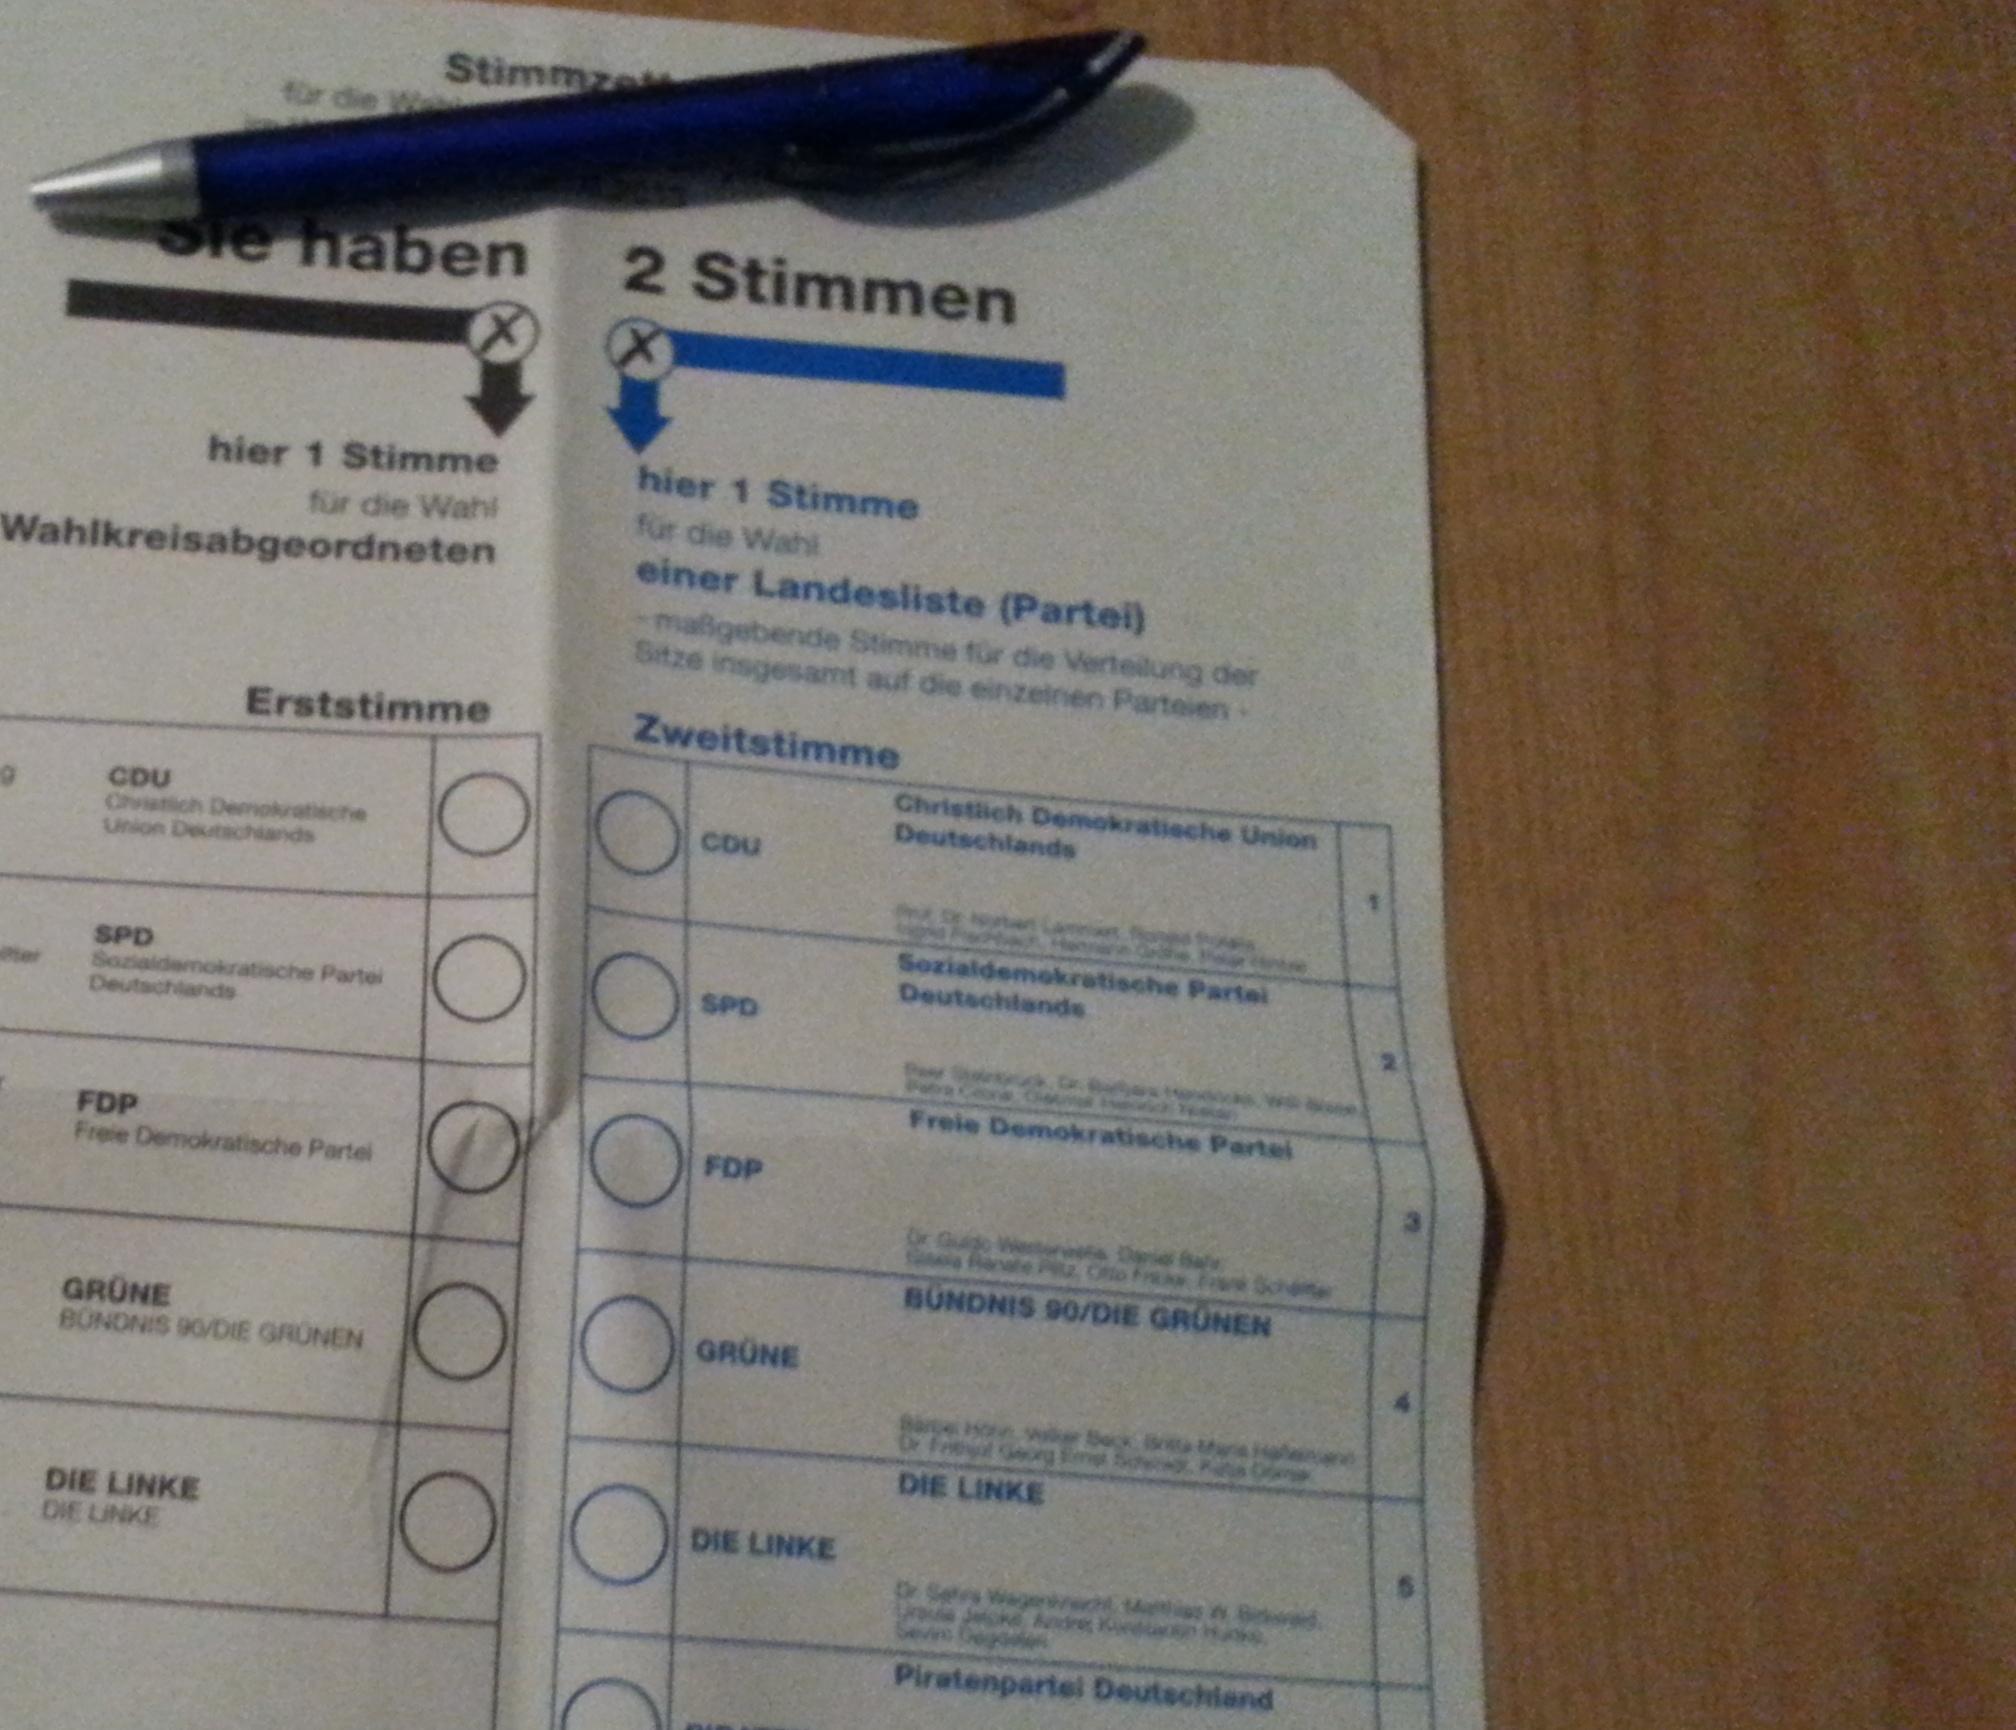 Stimmzettel 2013